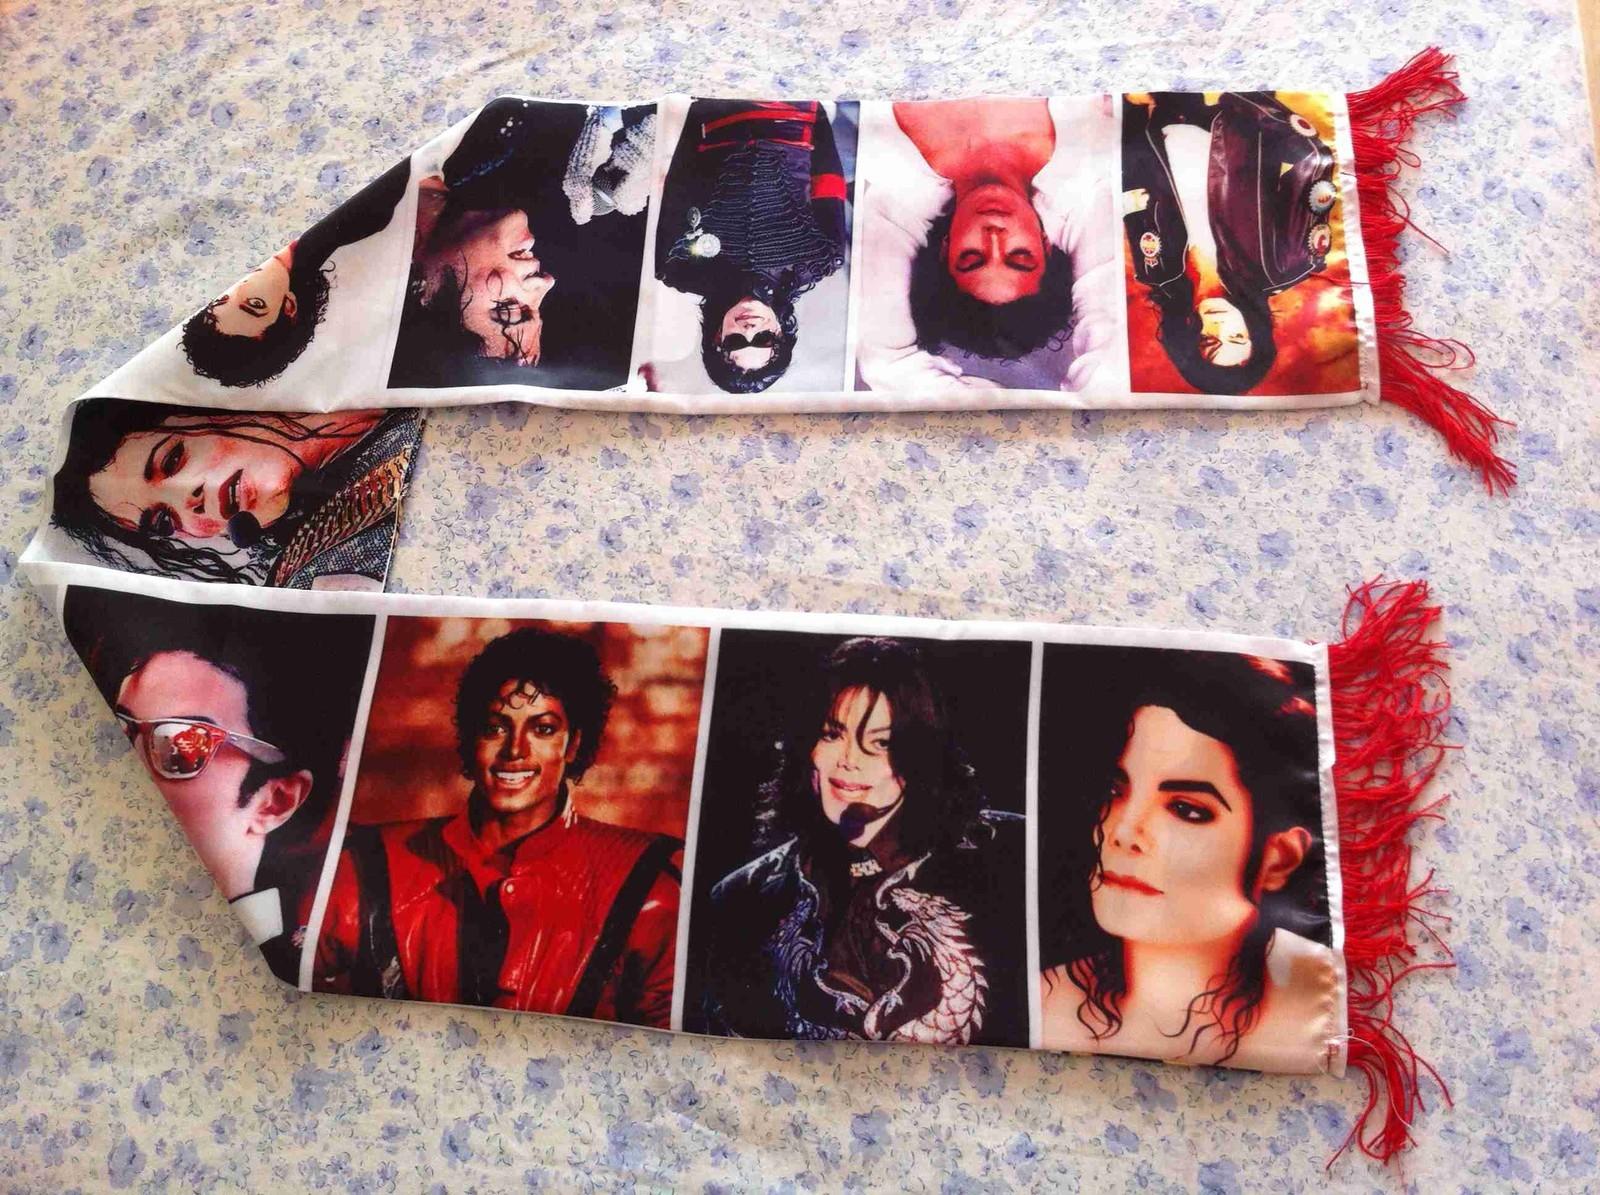 A Vintage Michael Jackson bungkus, balut Scarf